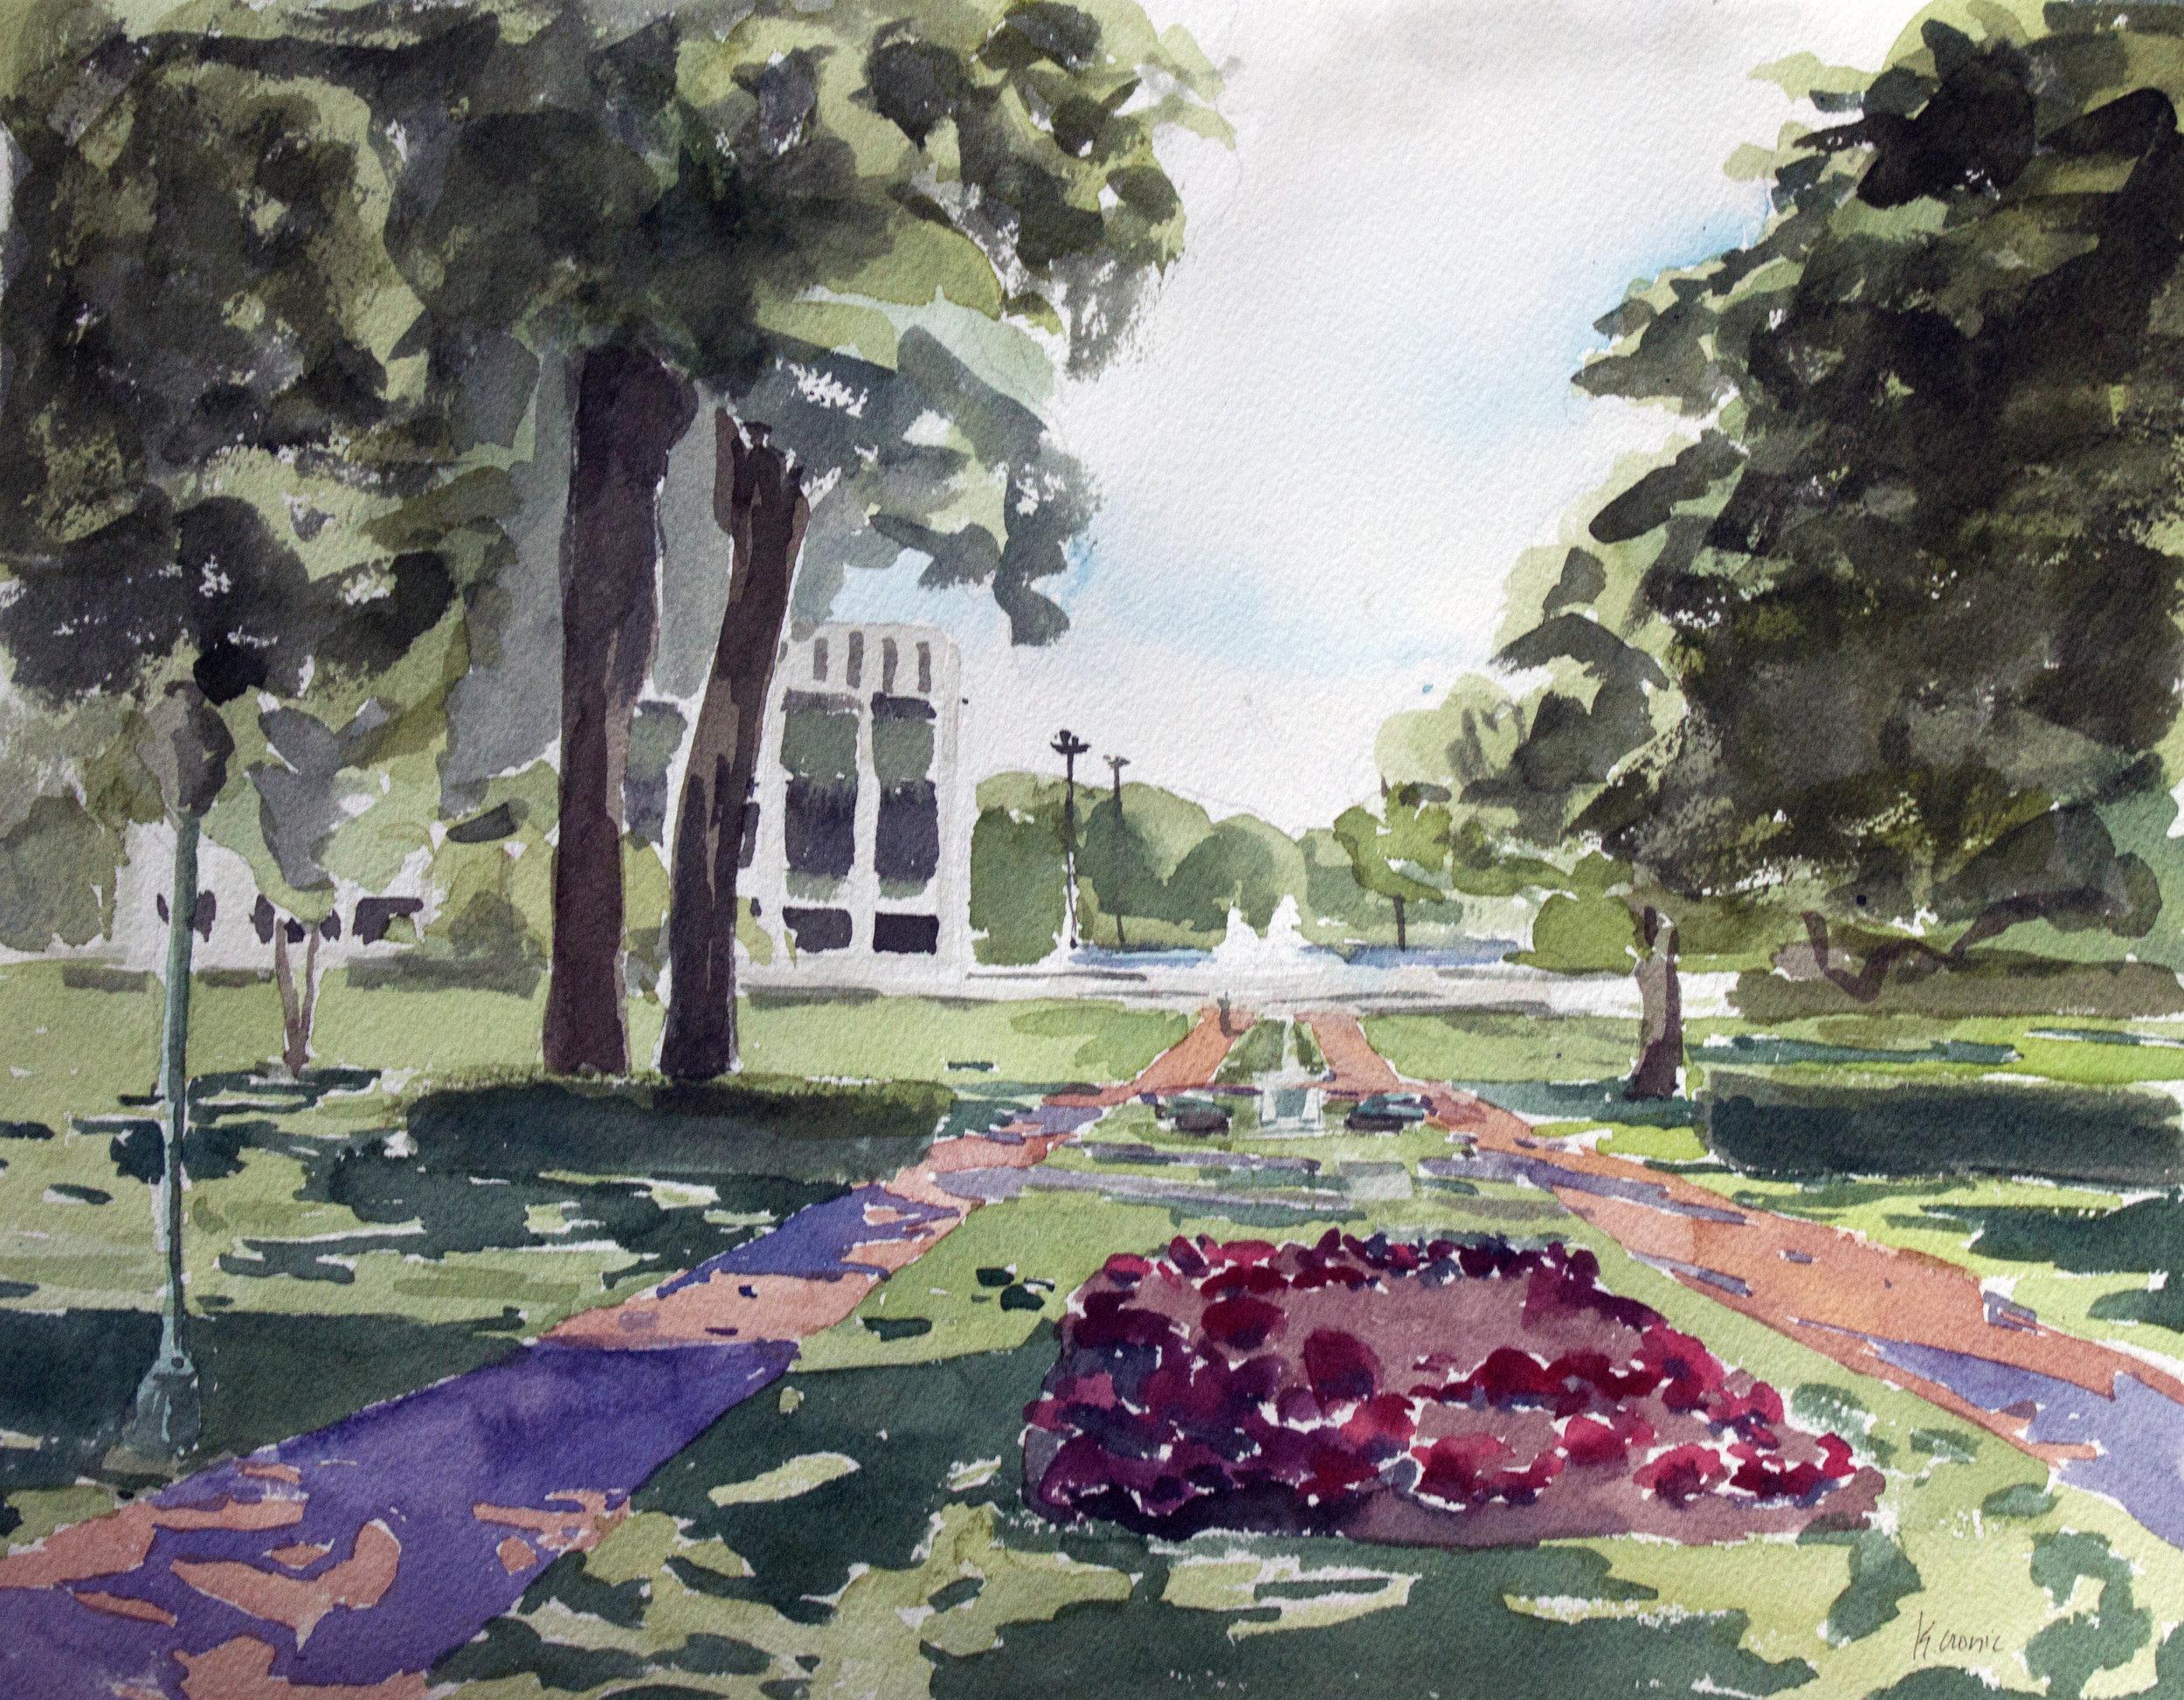 Watercolors of the Yard